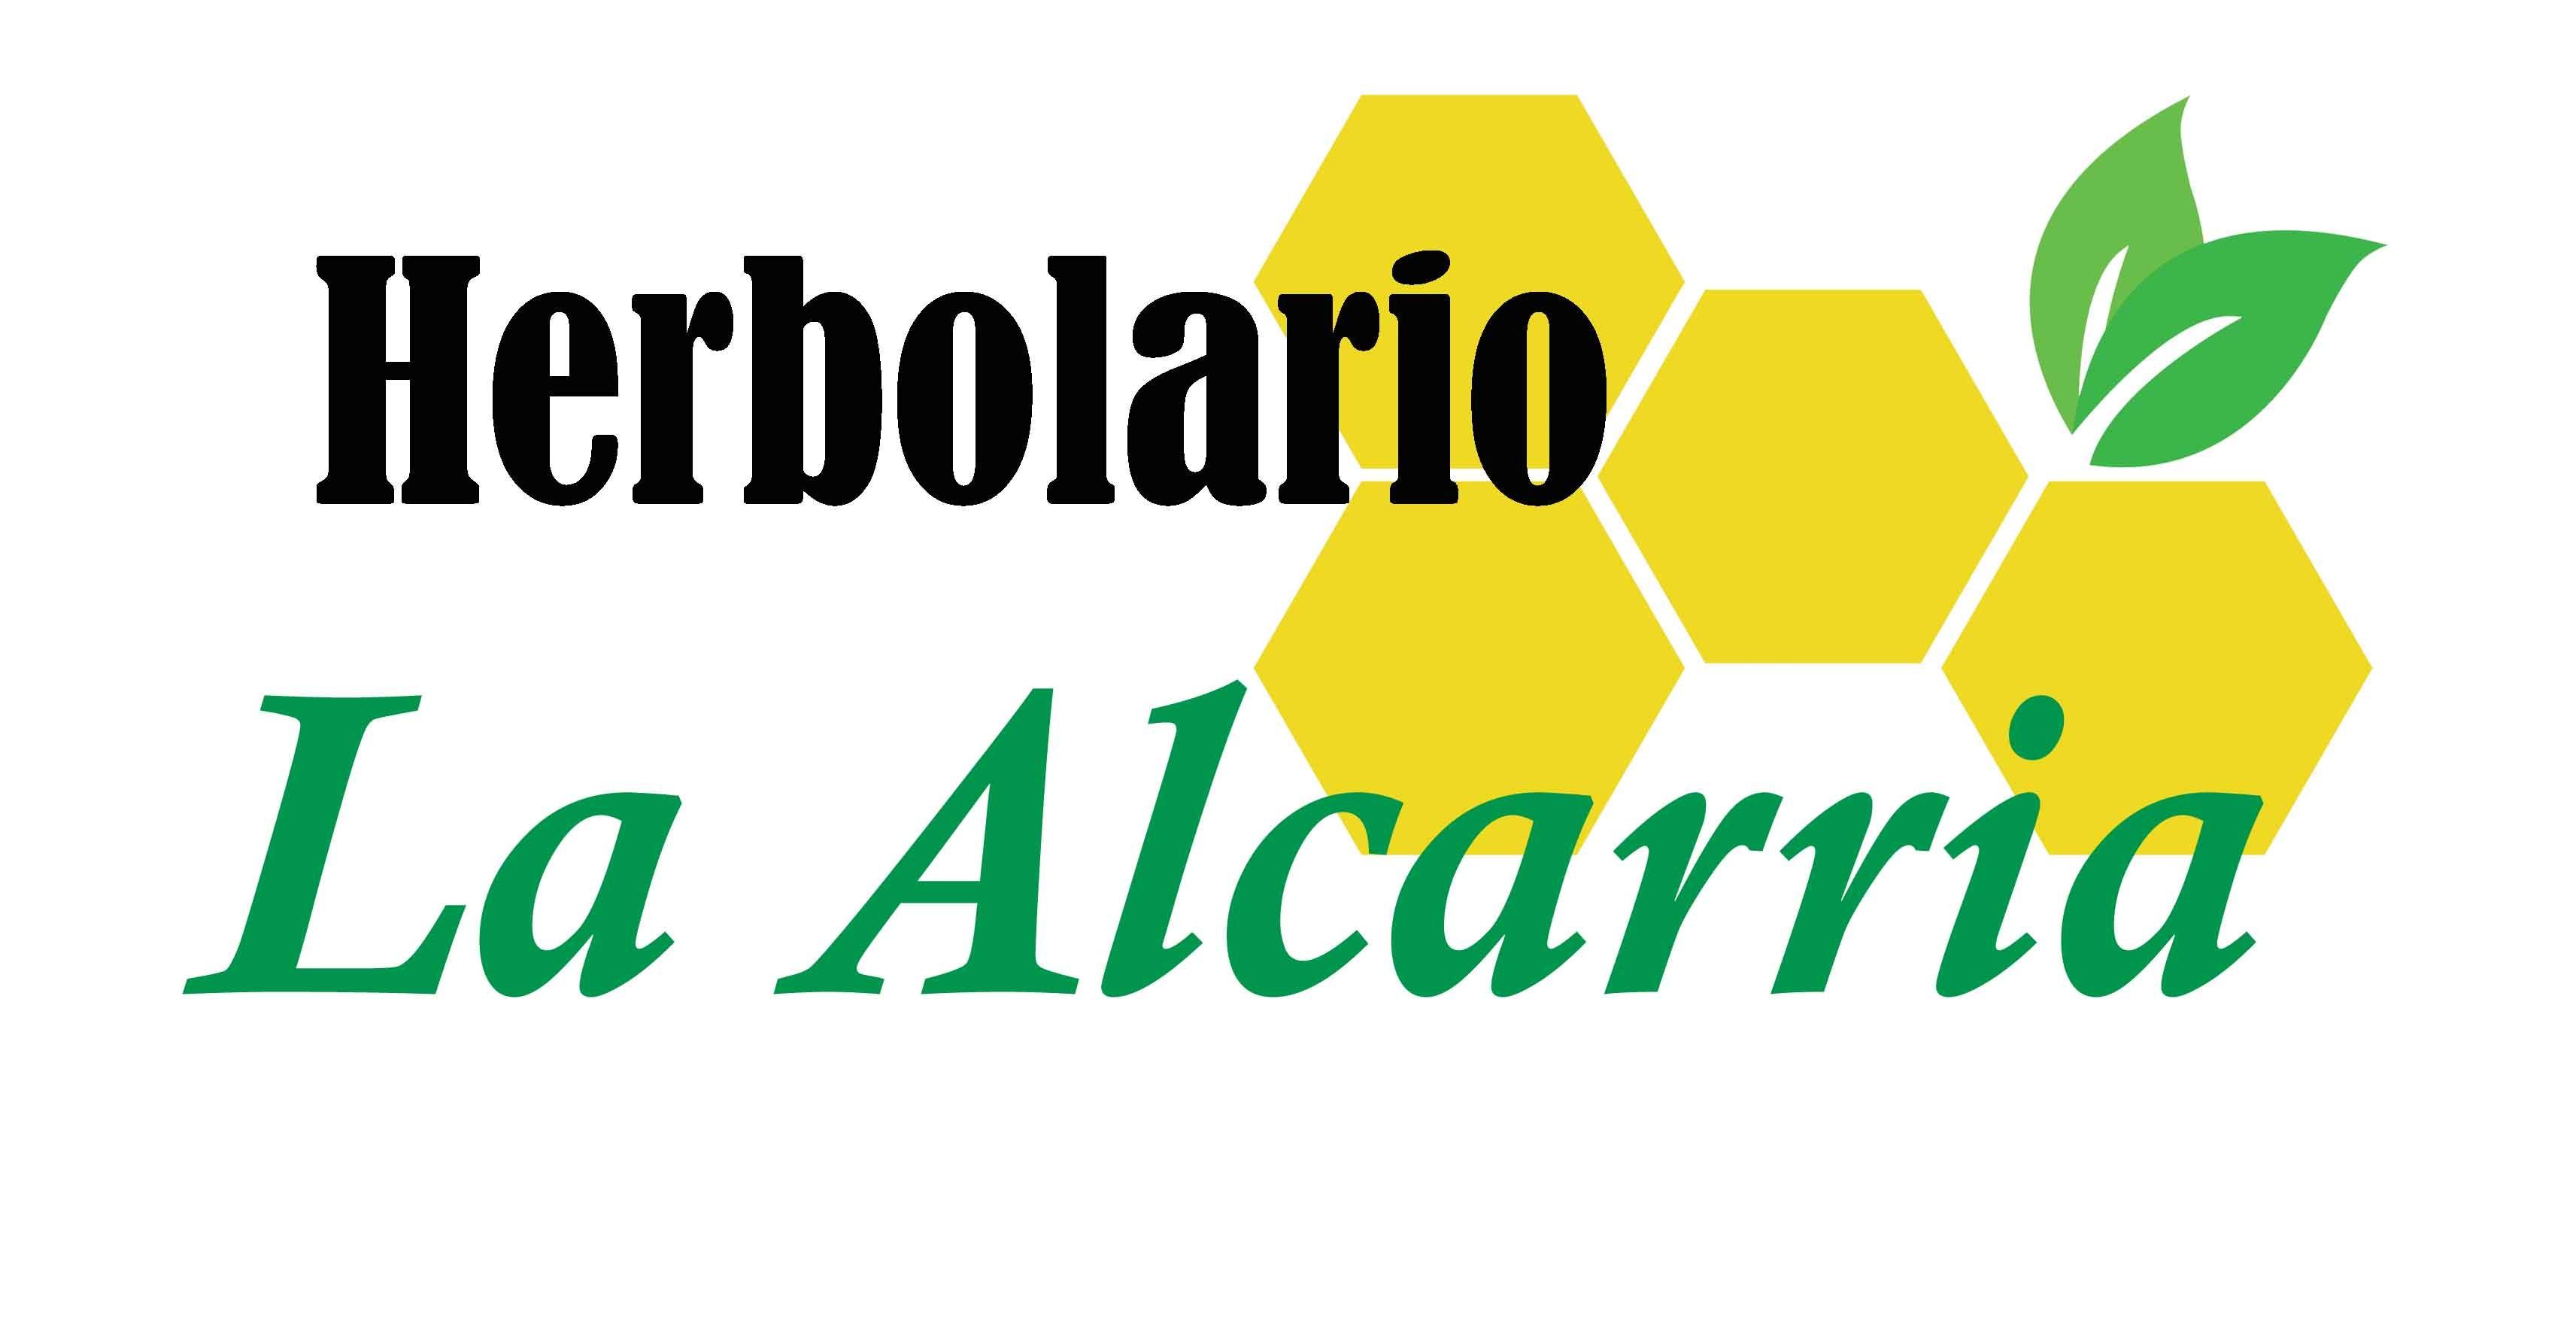 Herbolario La Alcarria